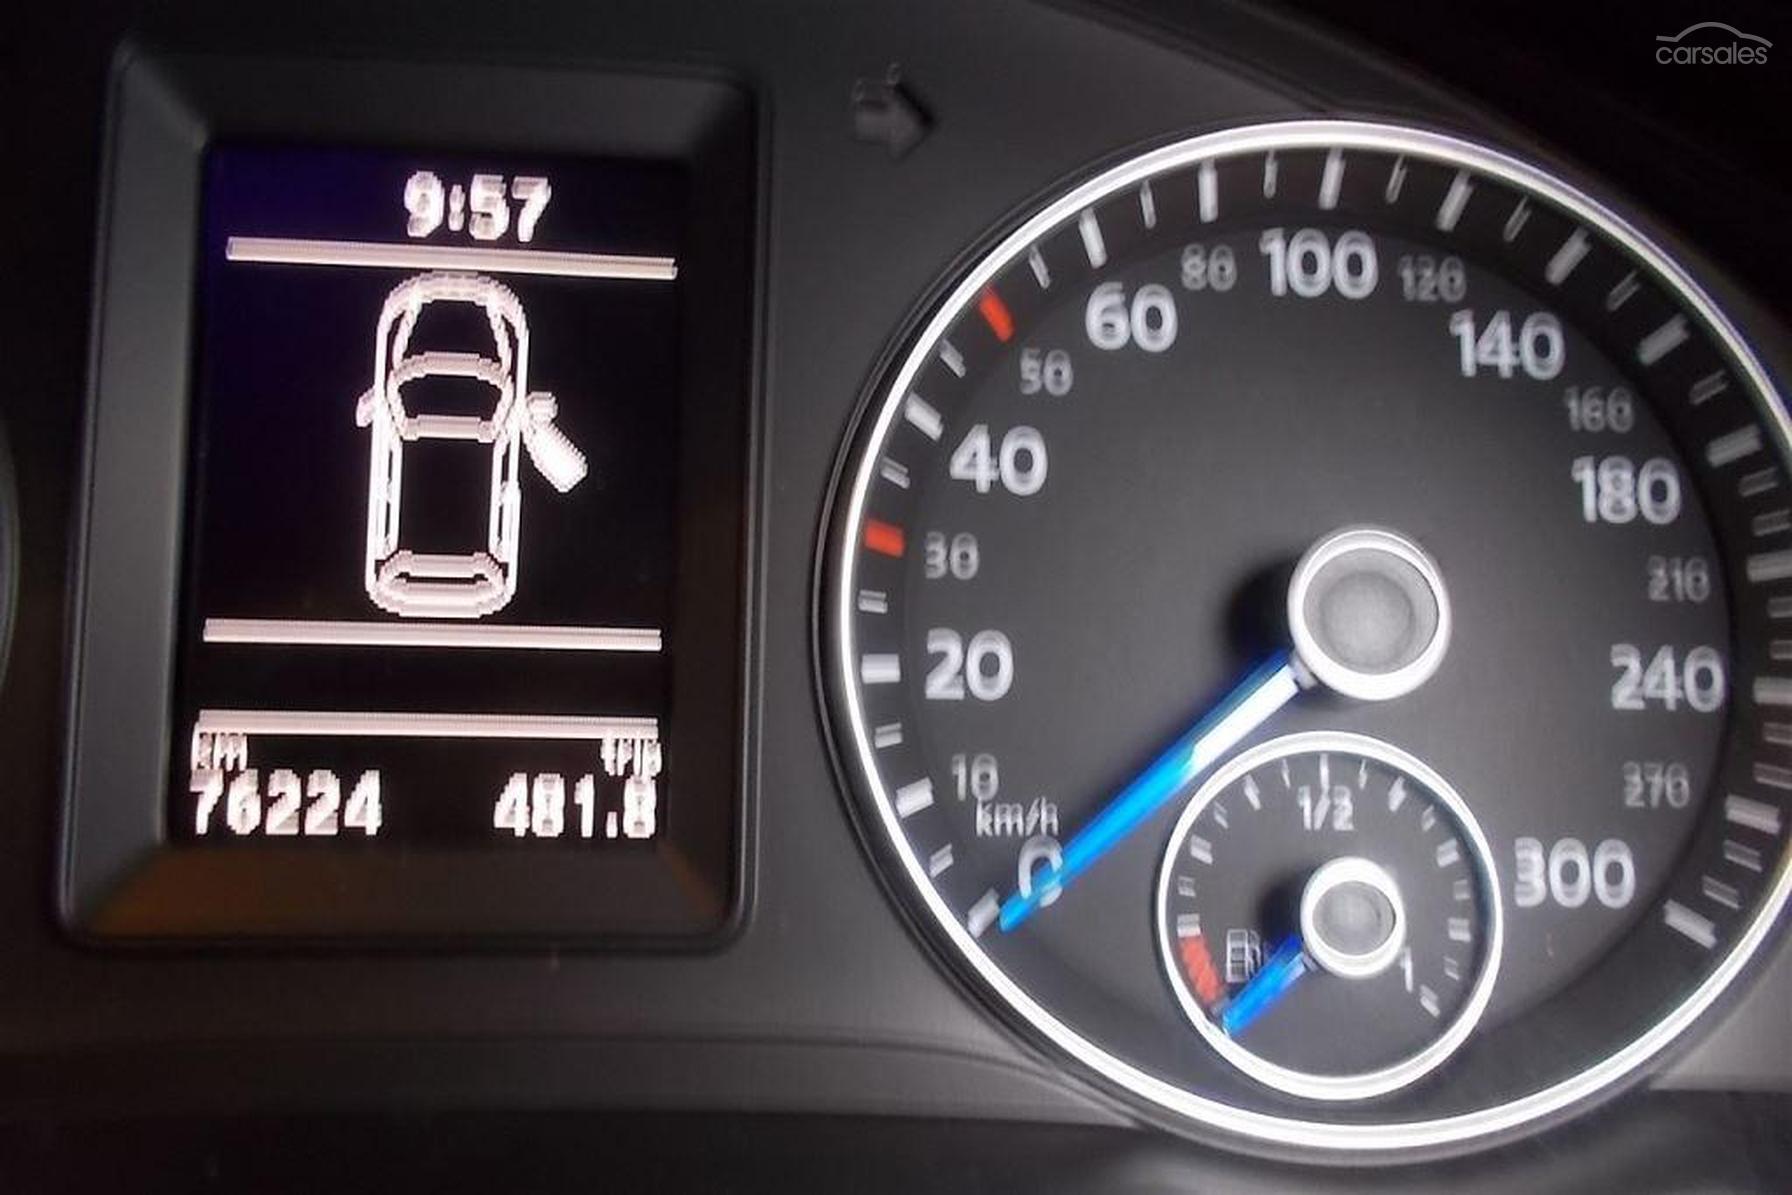 2012 Volkswagen Scirocco R 1s Auto My12 Oag Ad 16473932 Ultrasonic Parking Sonar By 4017